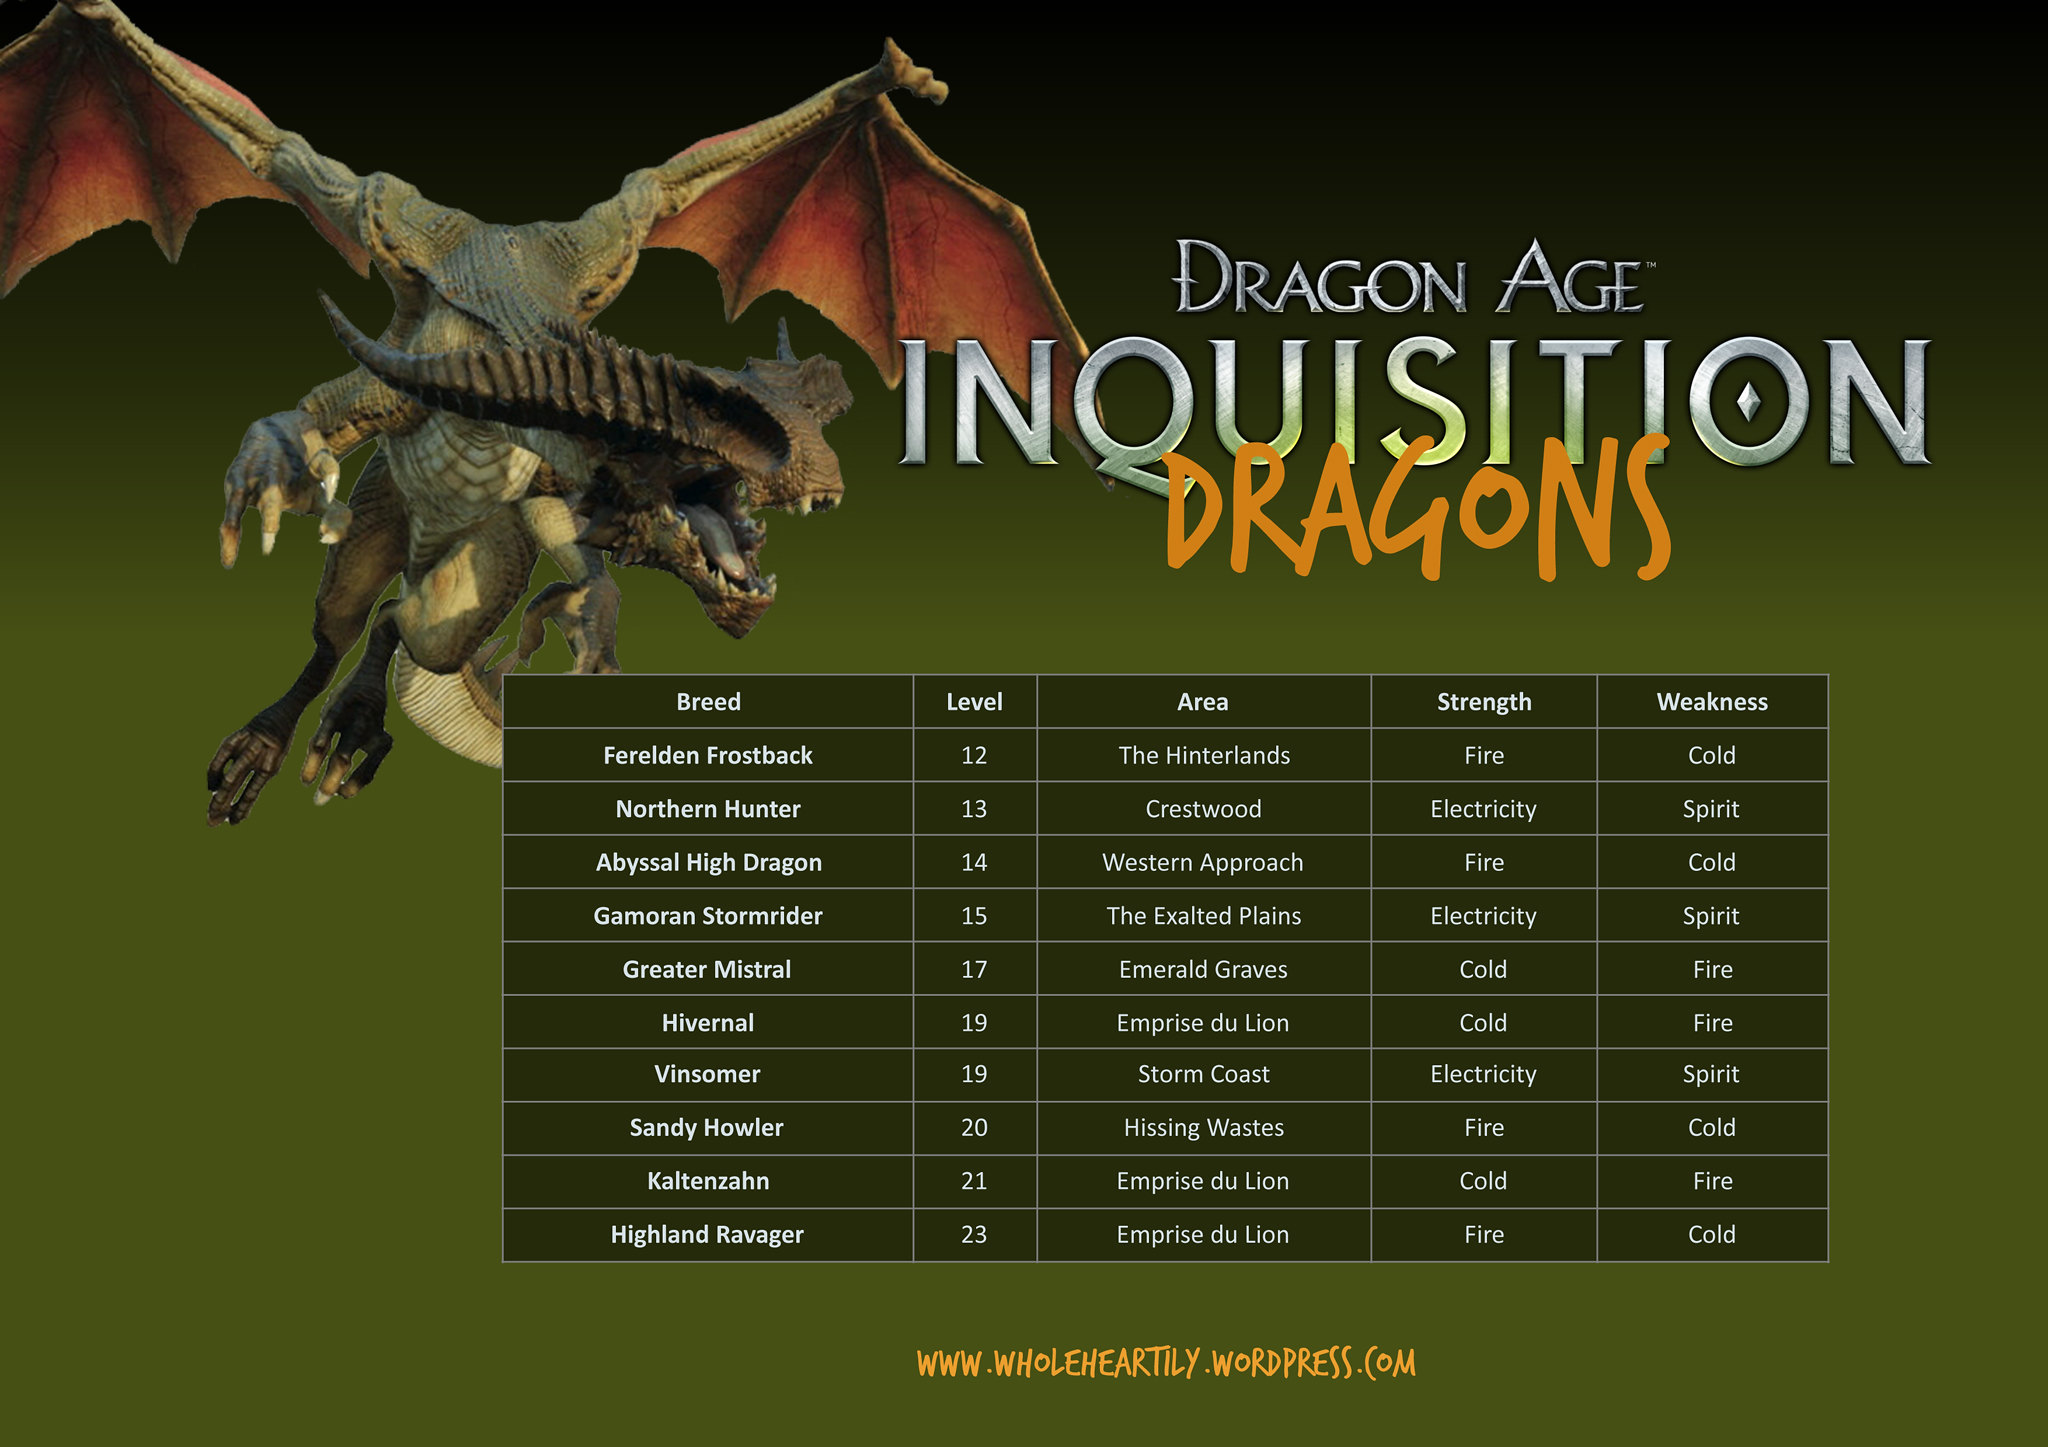 Dragon Age: Inquisition Dragons